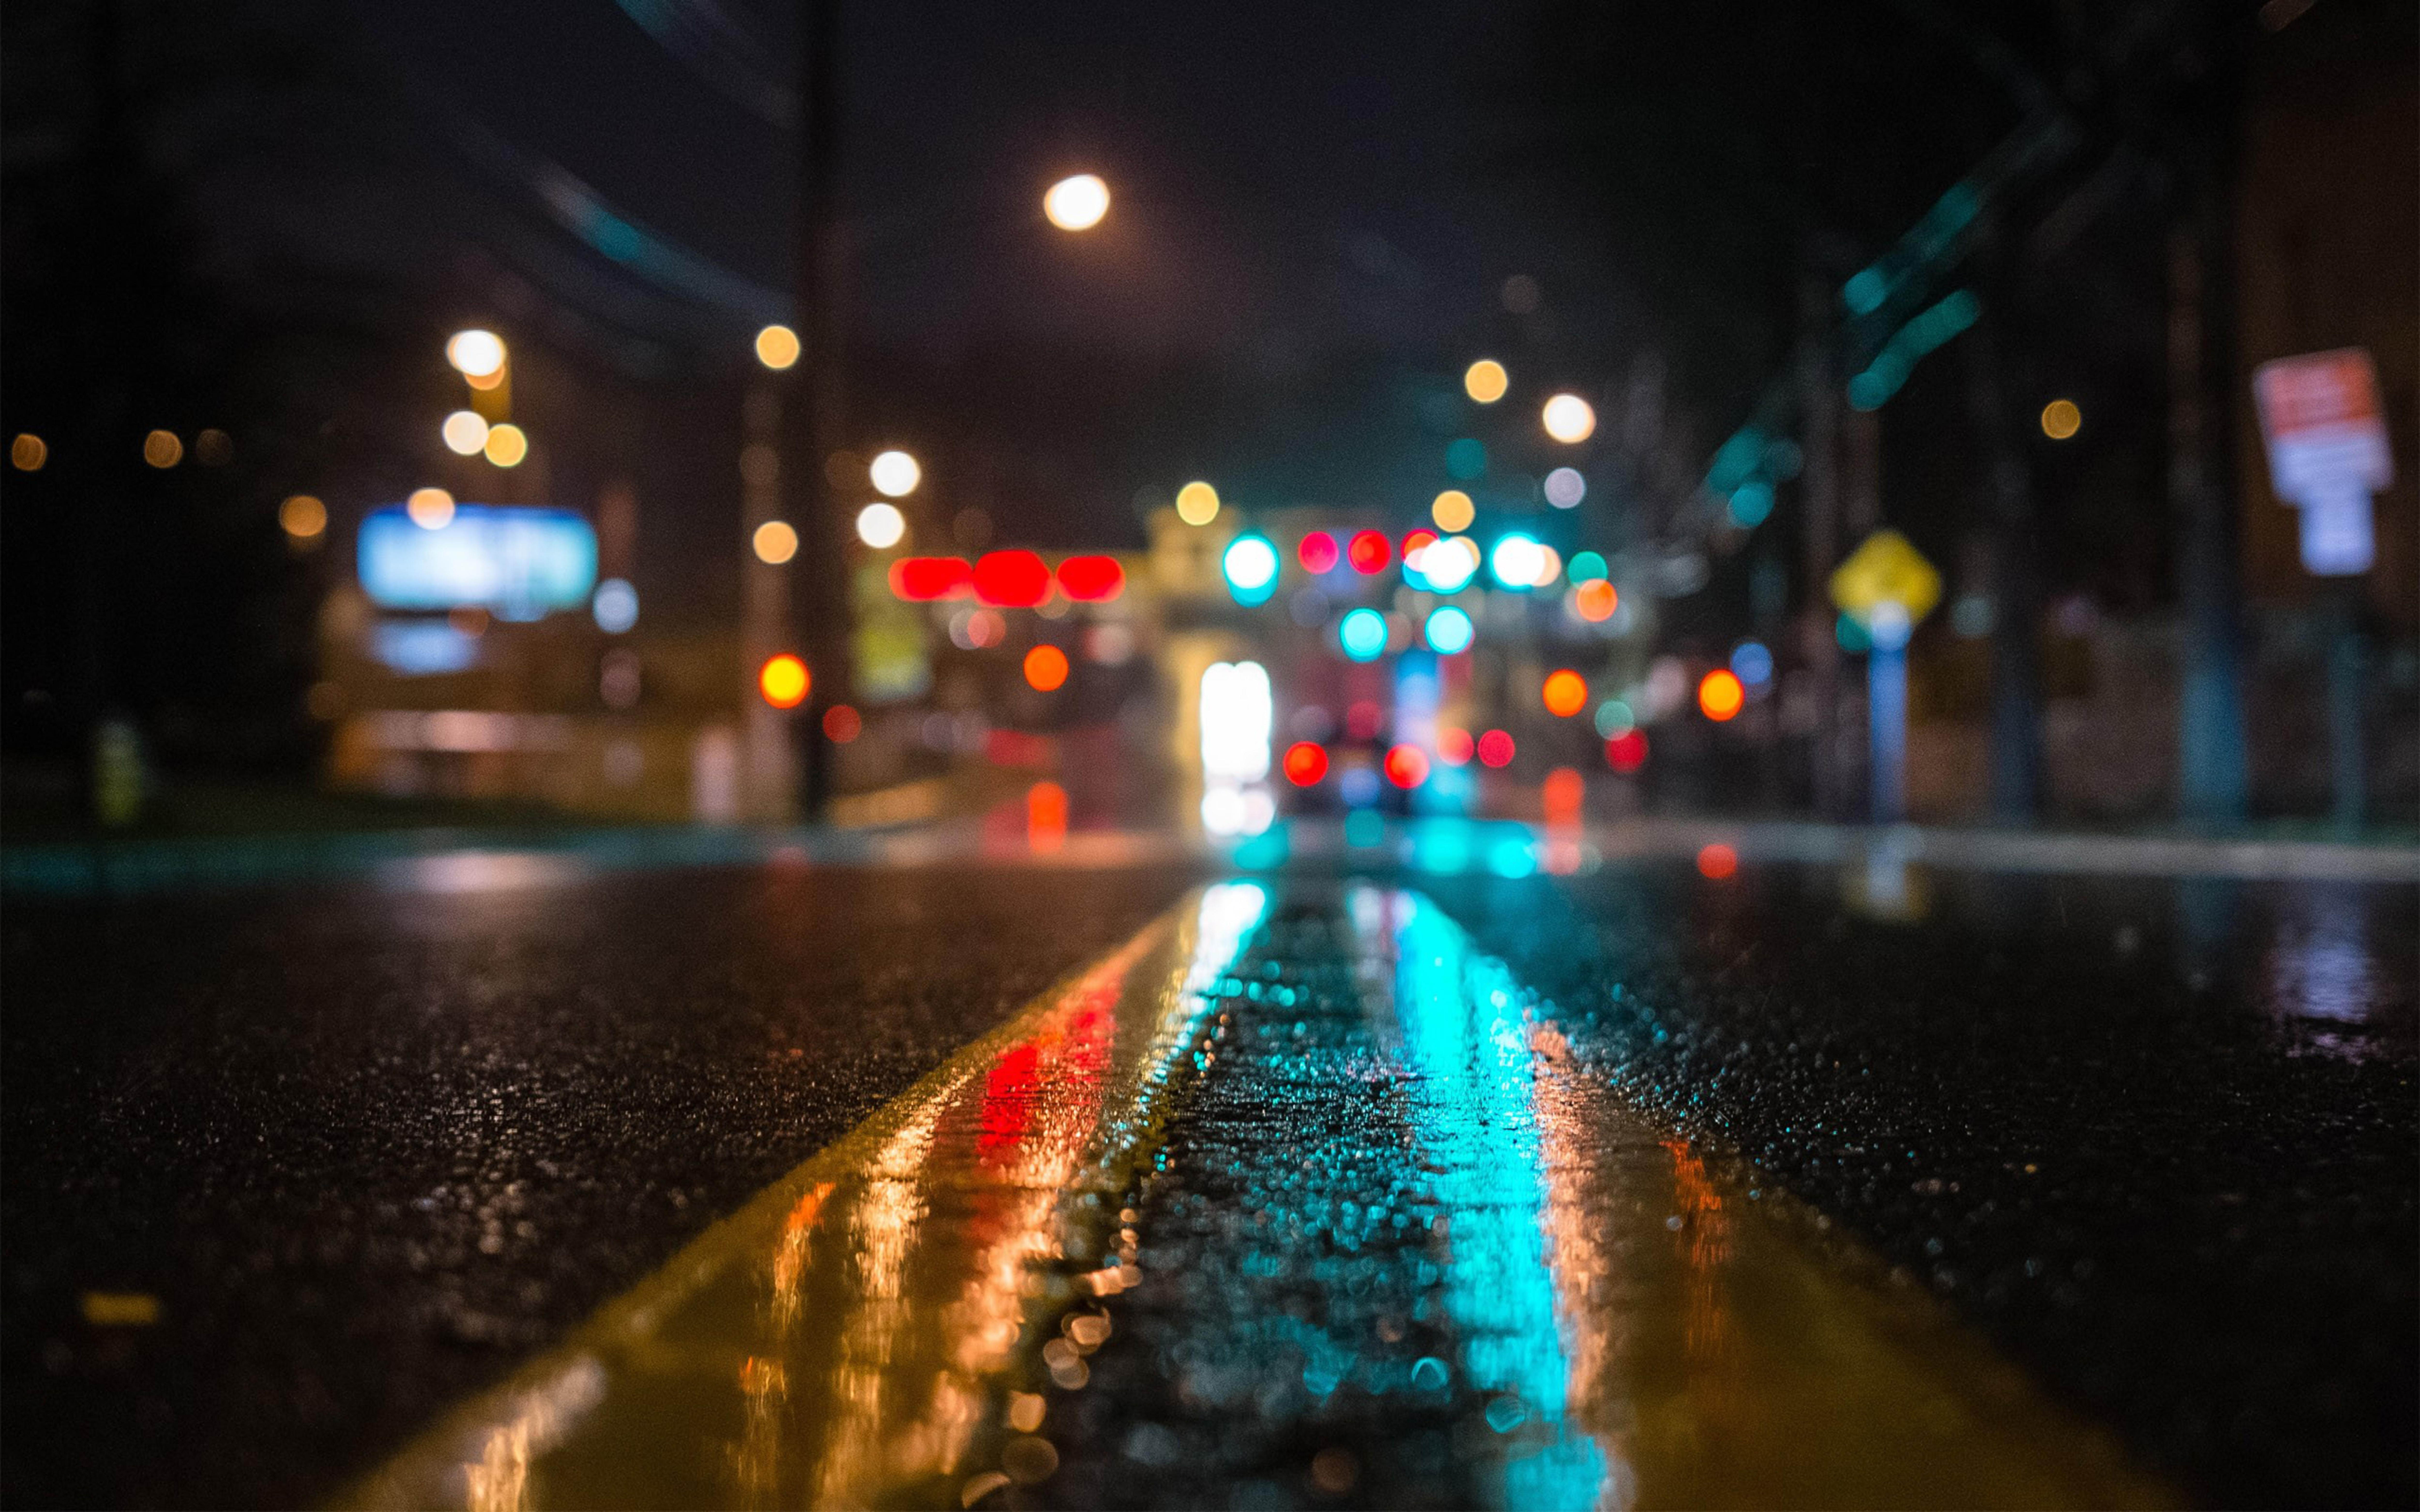 habit of rainy nights press - HD1920×1200